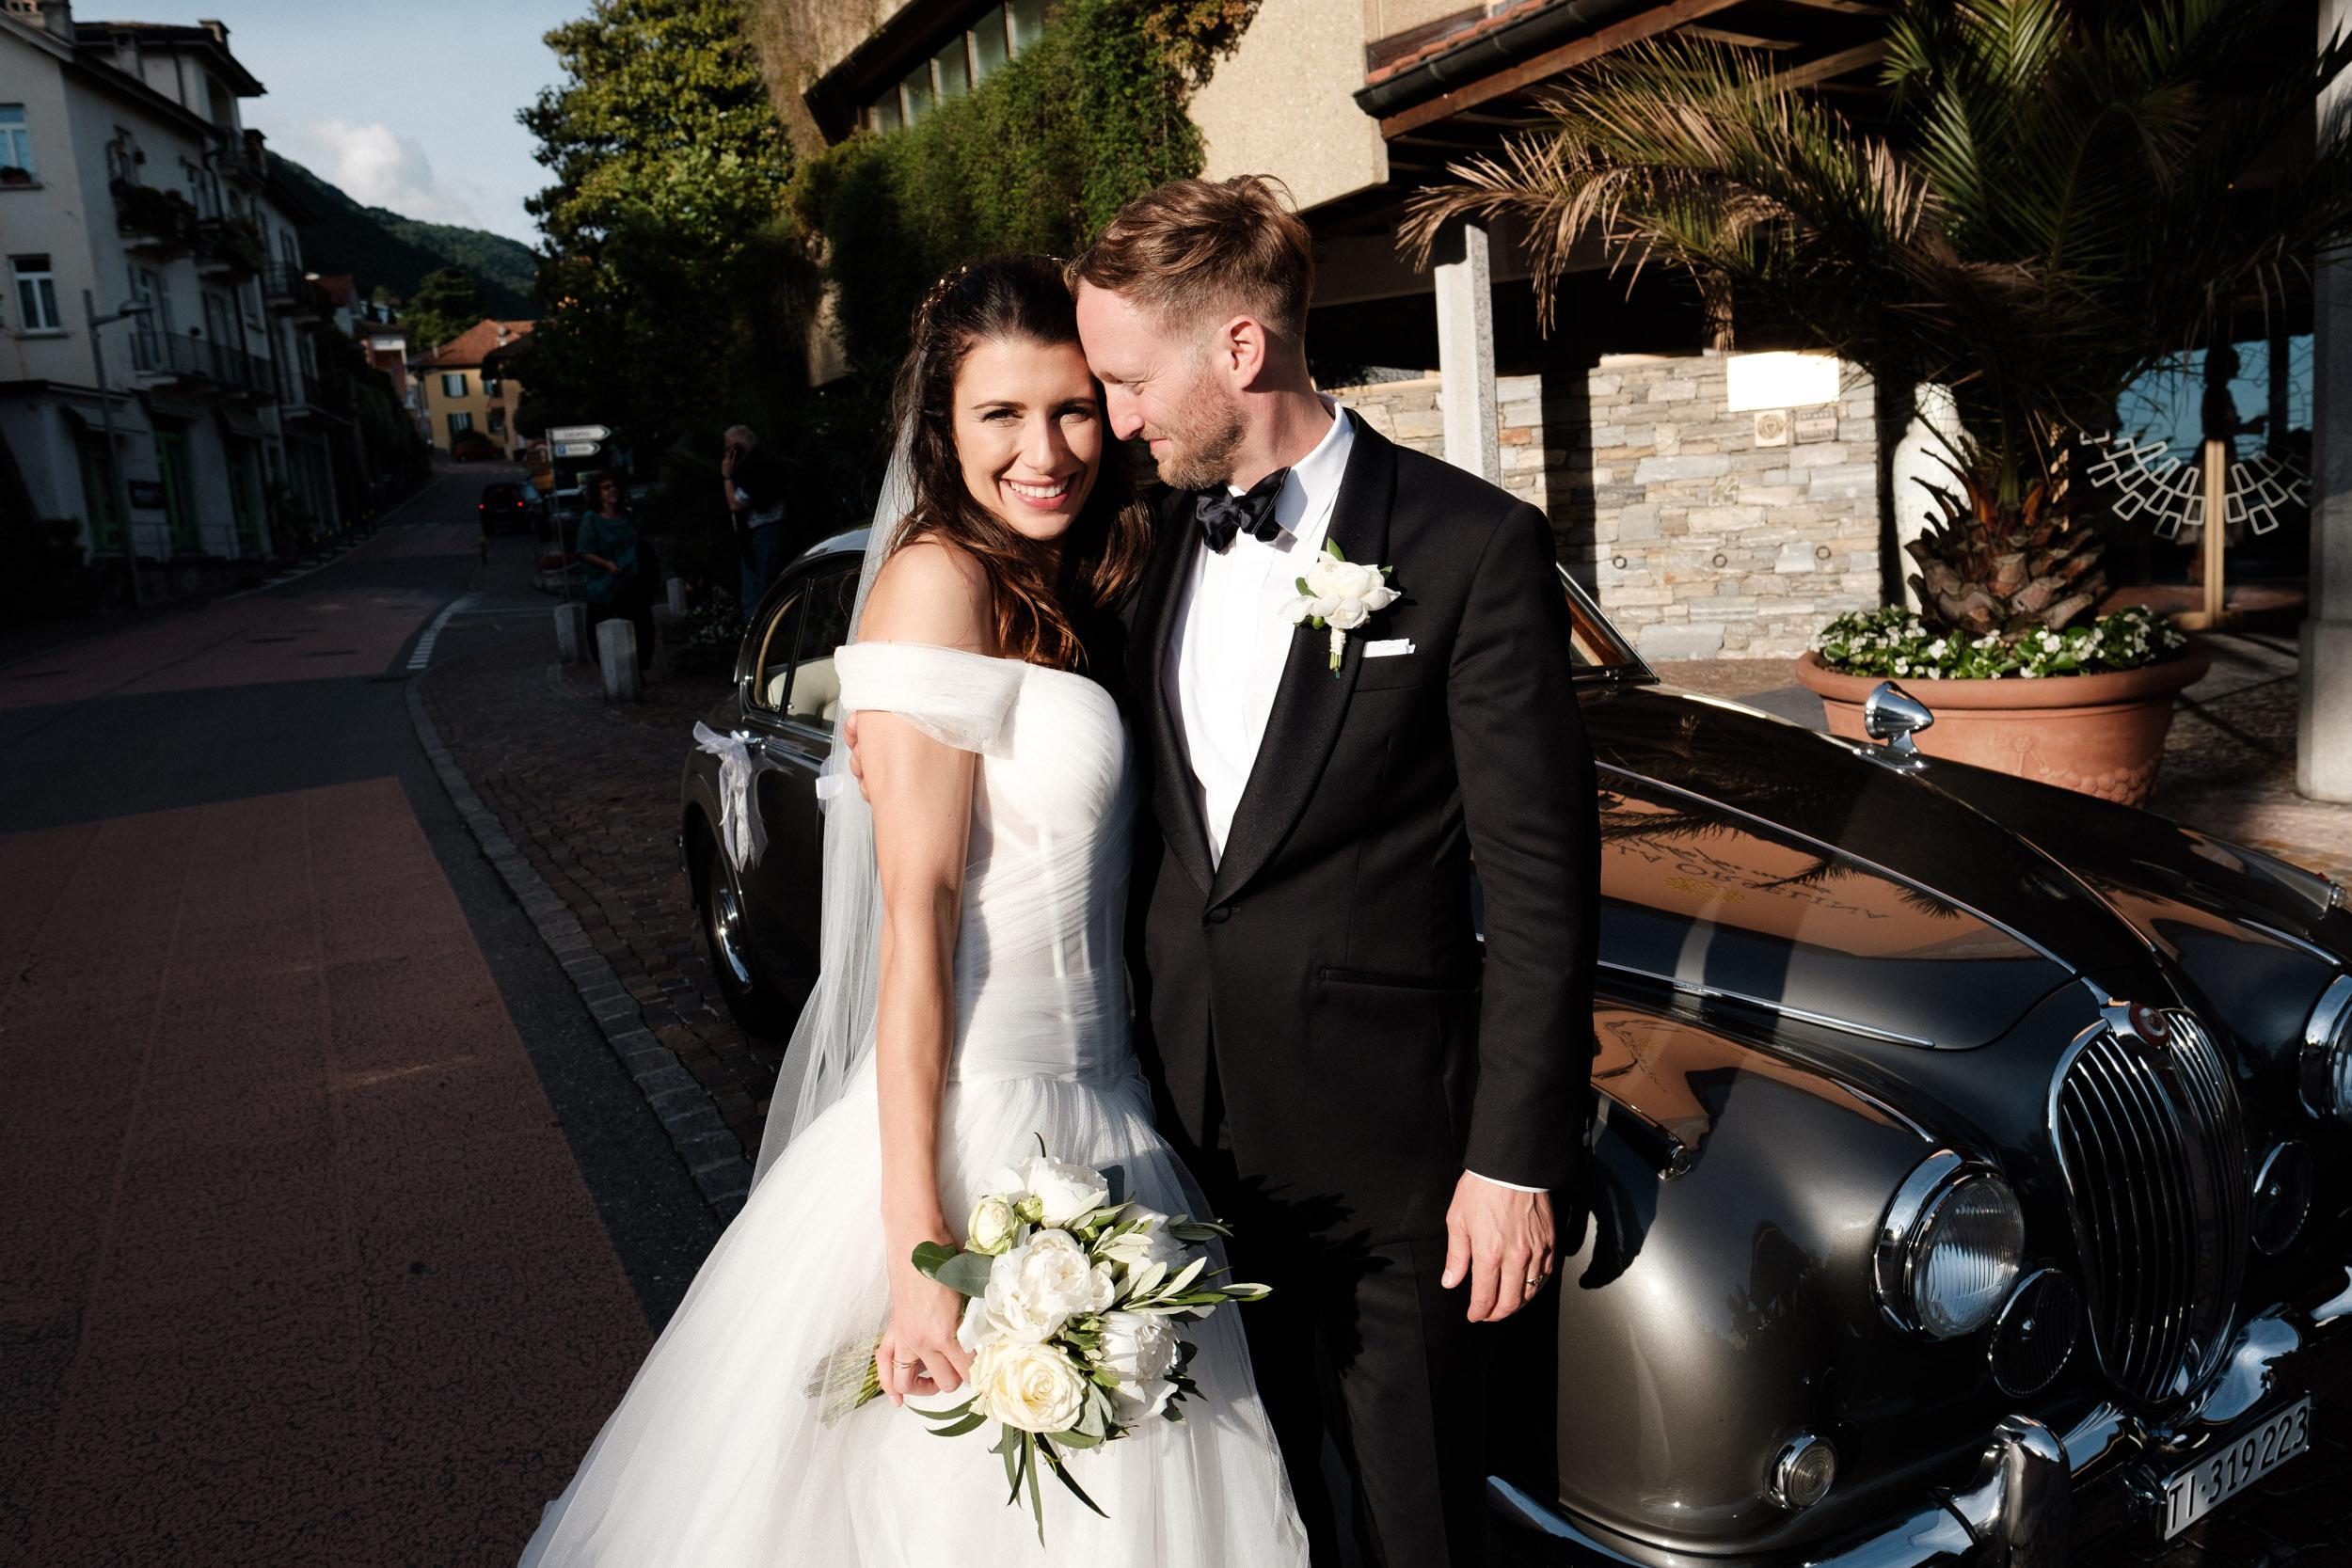 olivia-andreas-wedding-switzerland-468.jpg